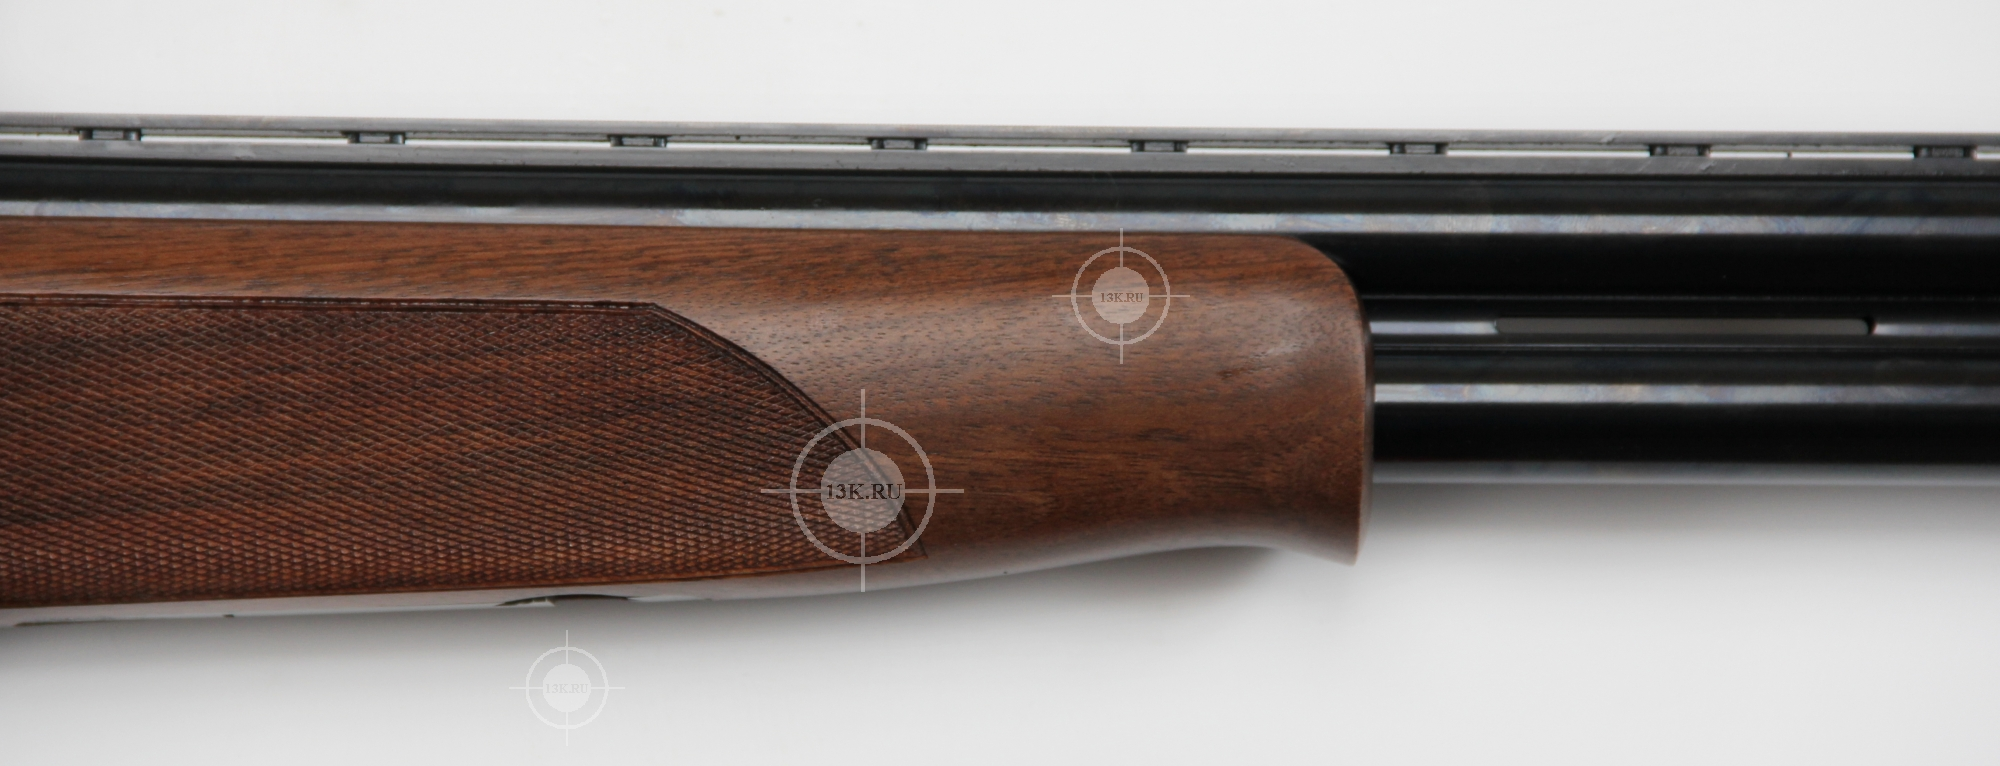 Browning b 525 sporter 1 кал 12 76 ствол 810 мм дн